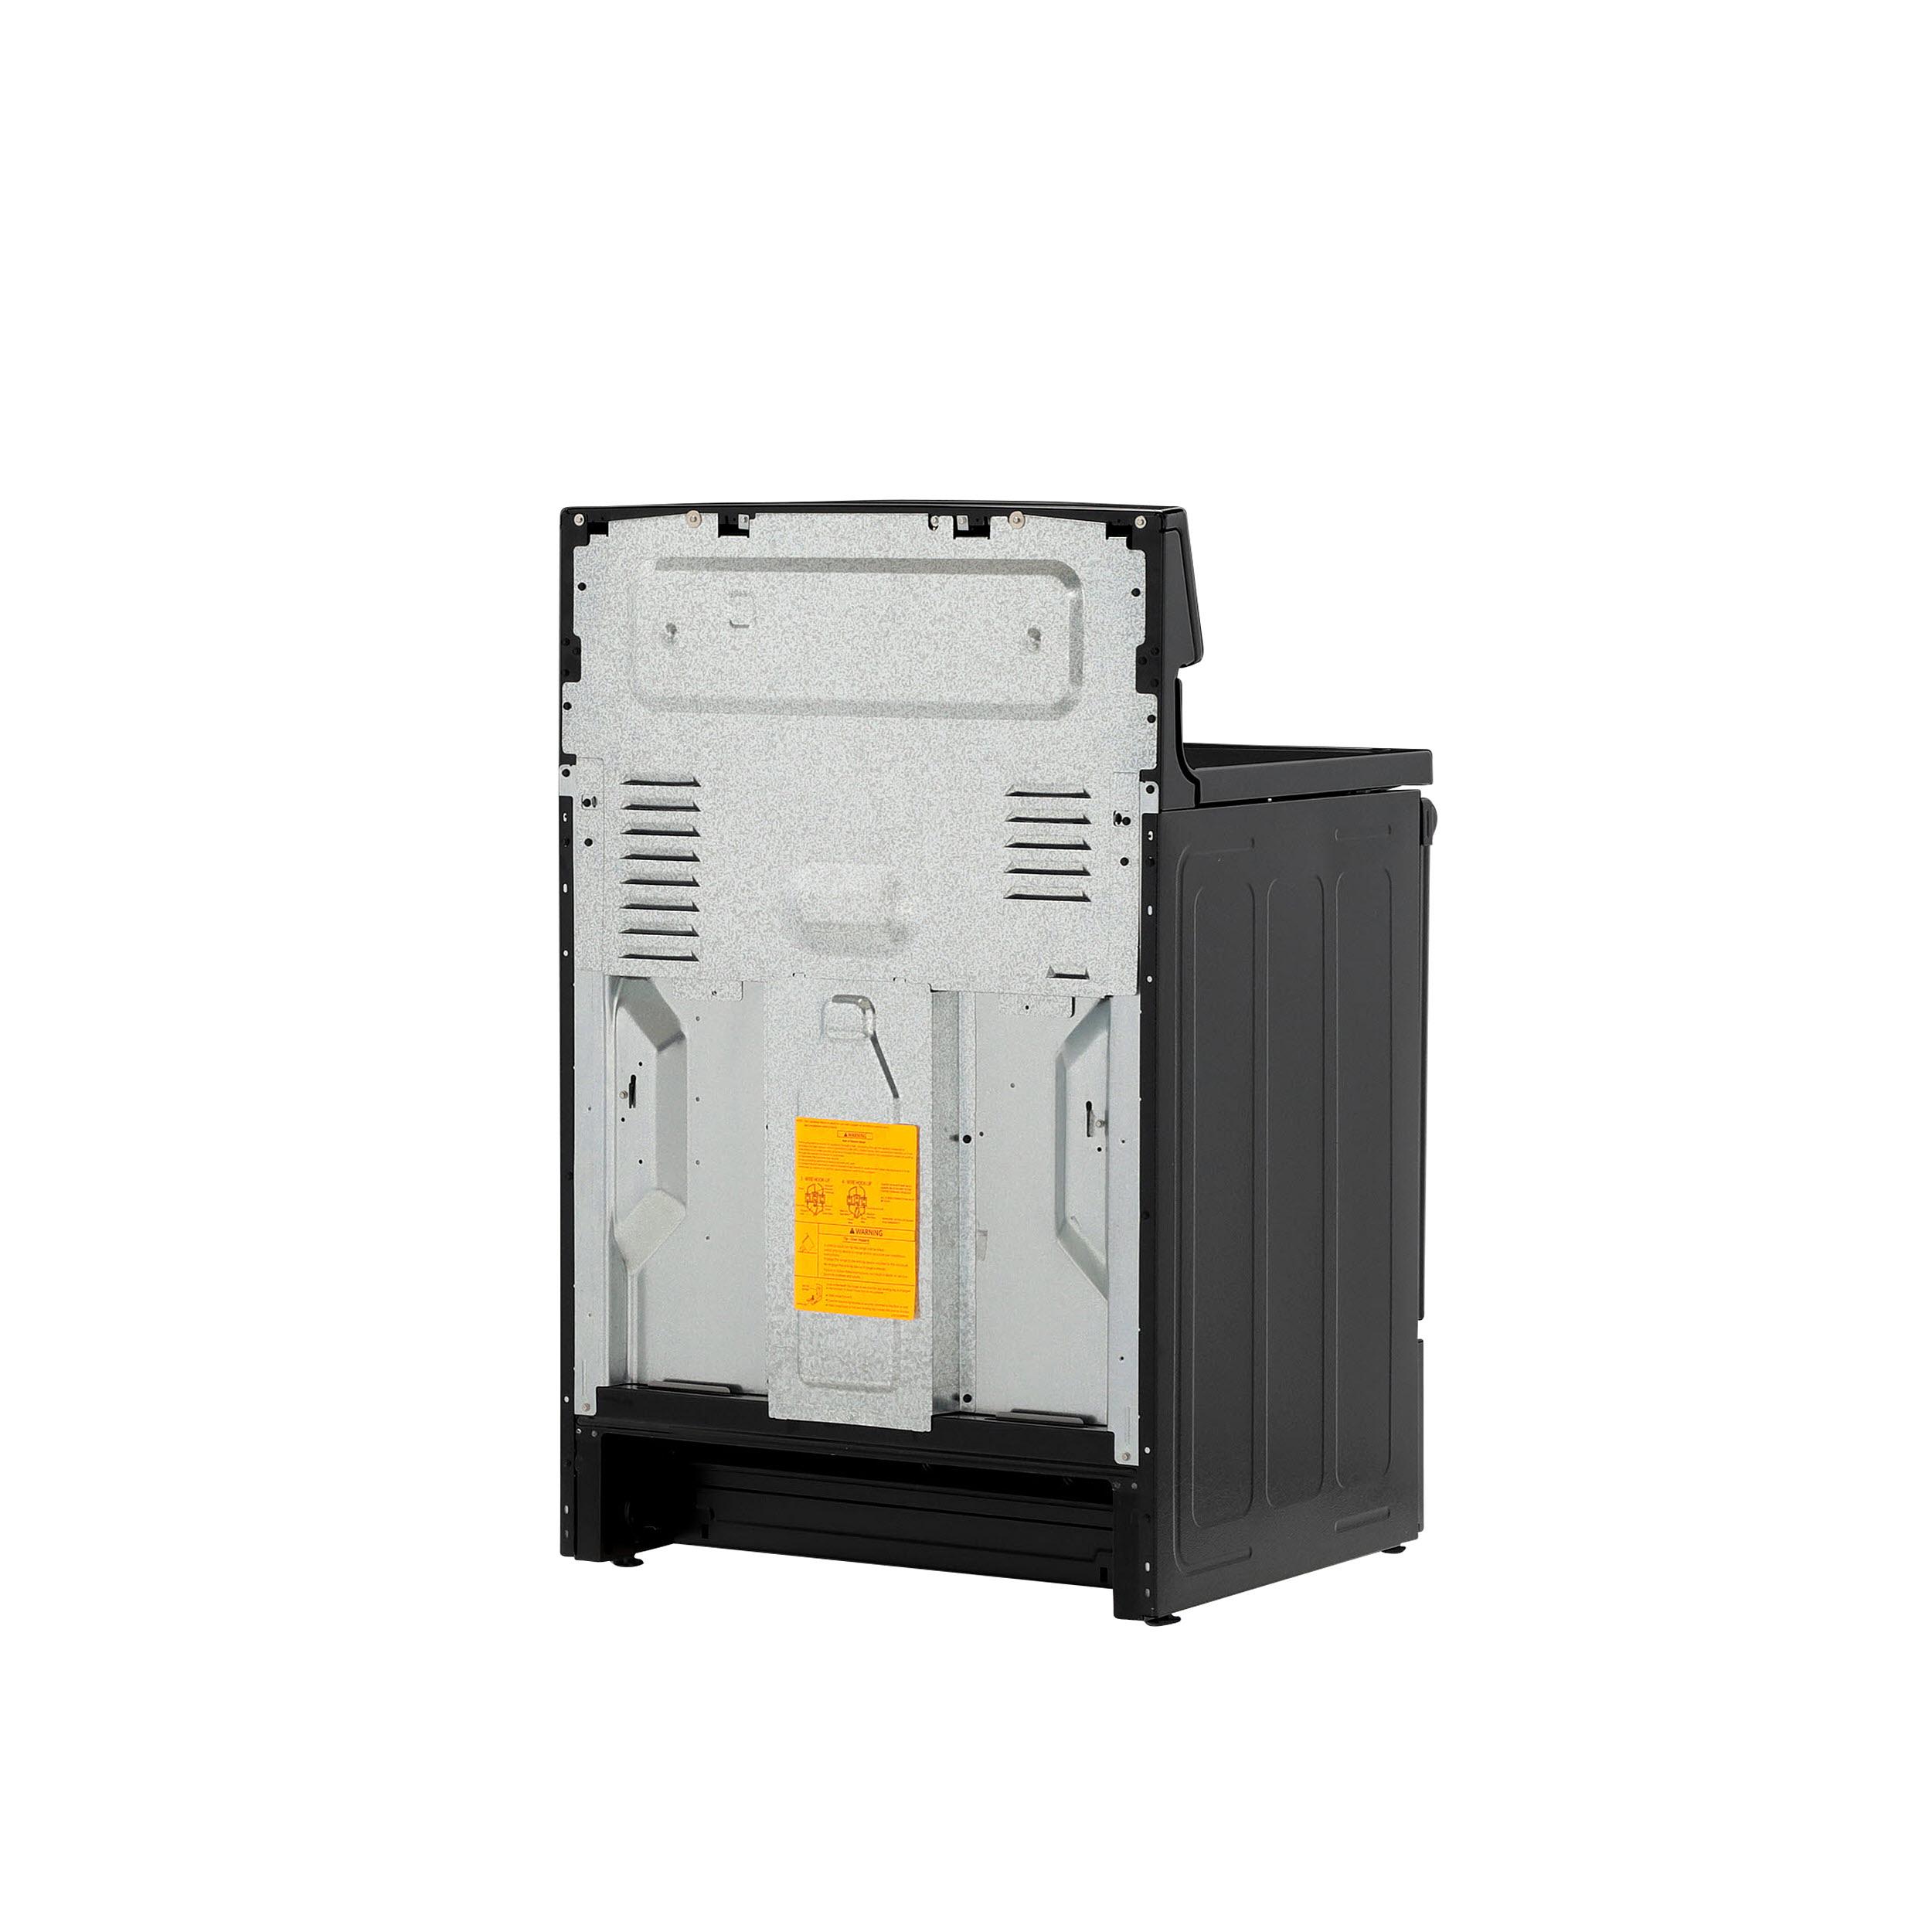 "Model: JB645DKBB   GE GE® 30"" Free-Standing Electric Range"